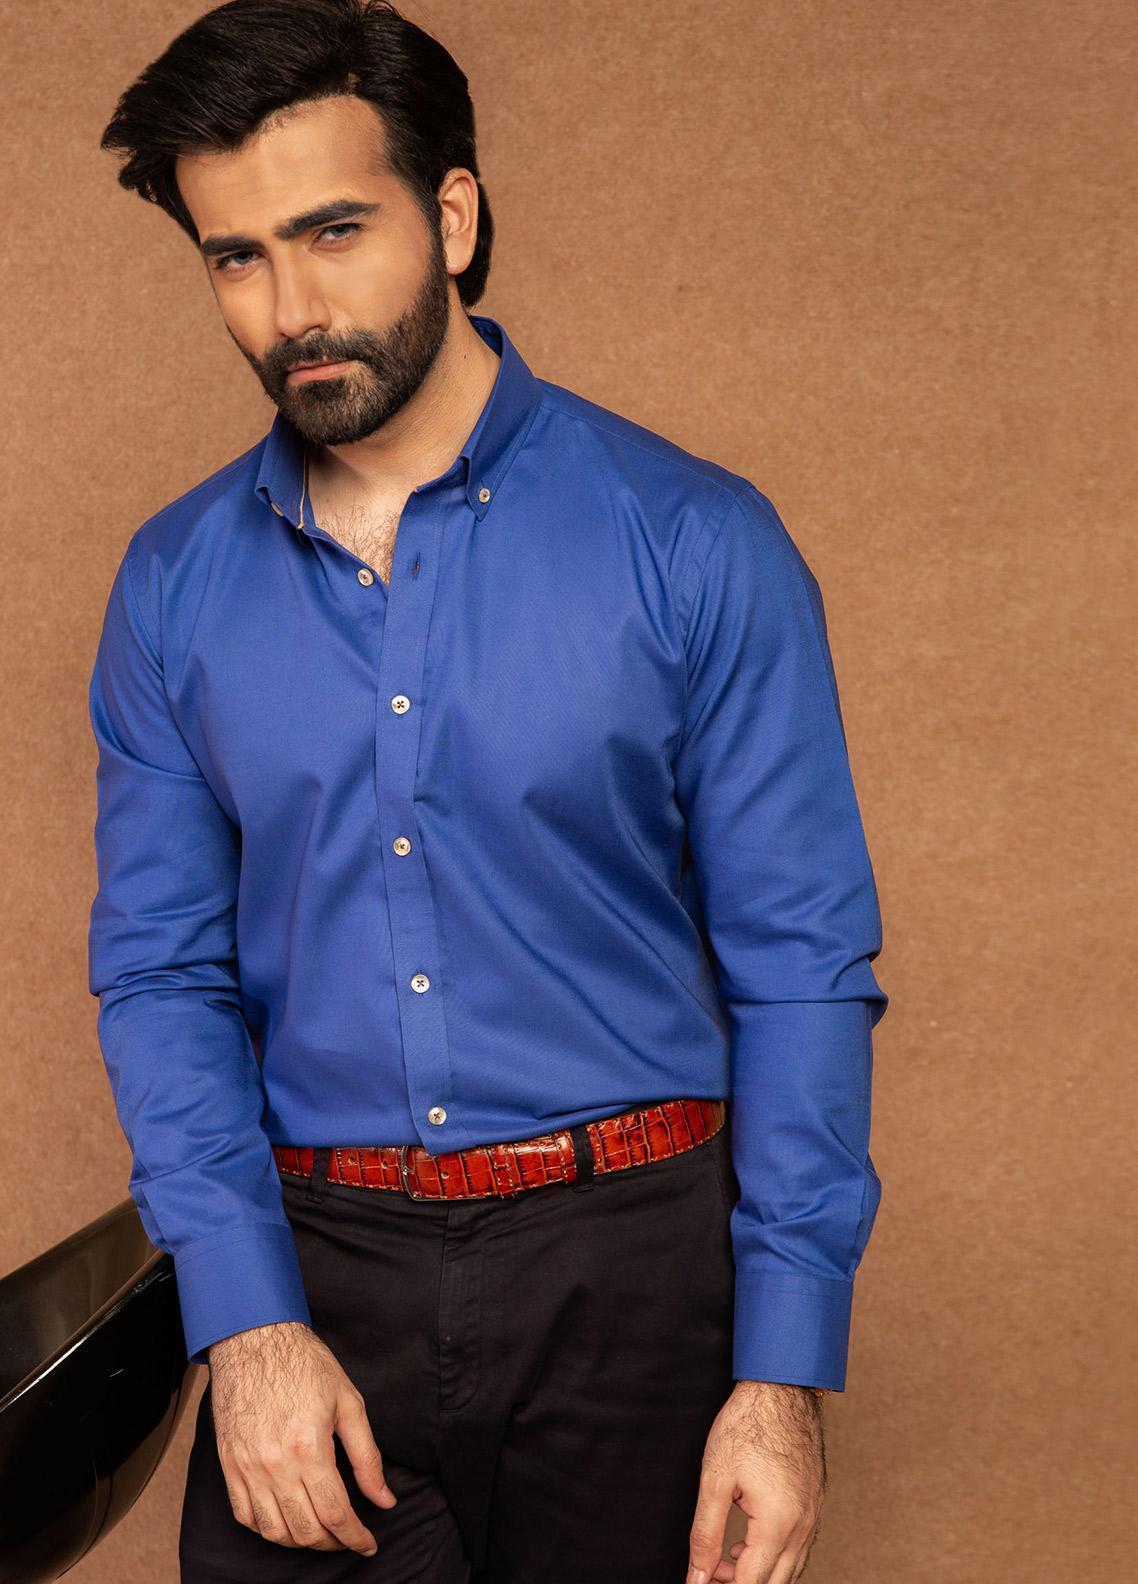 Brumano Cotton Formal Shirts for Men - Royal Blue BRM-724